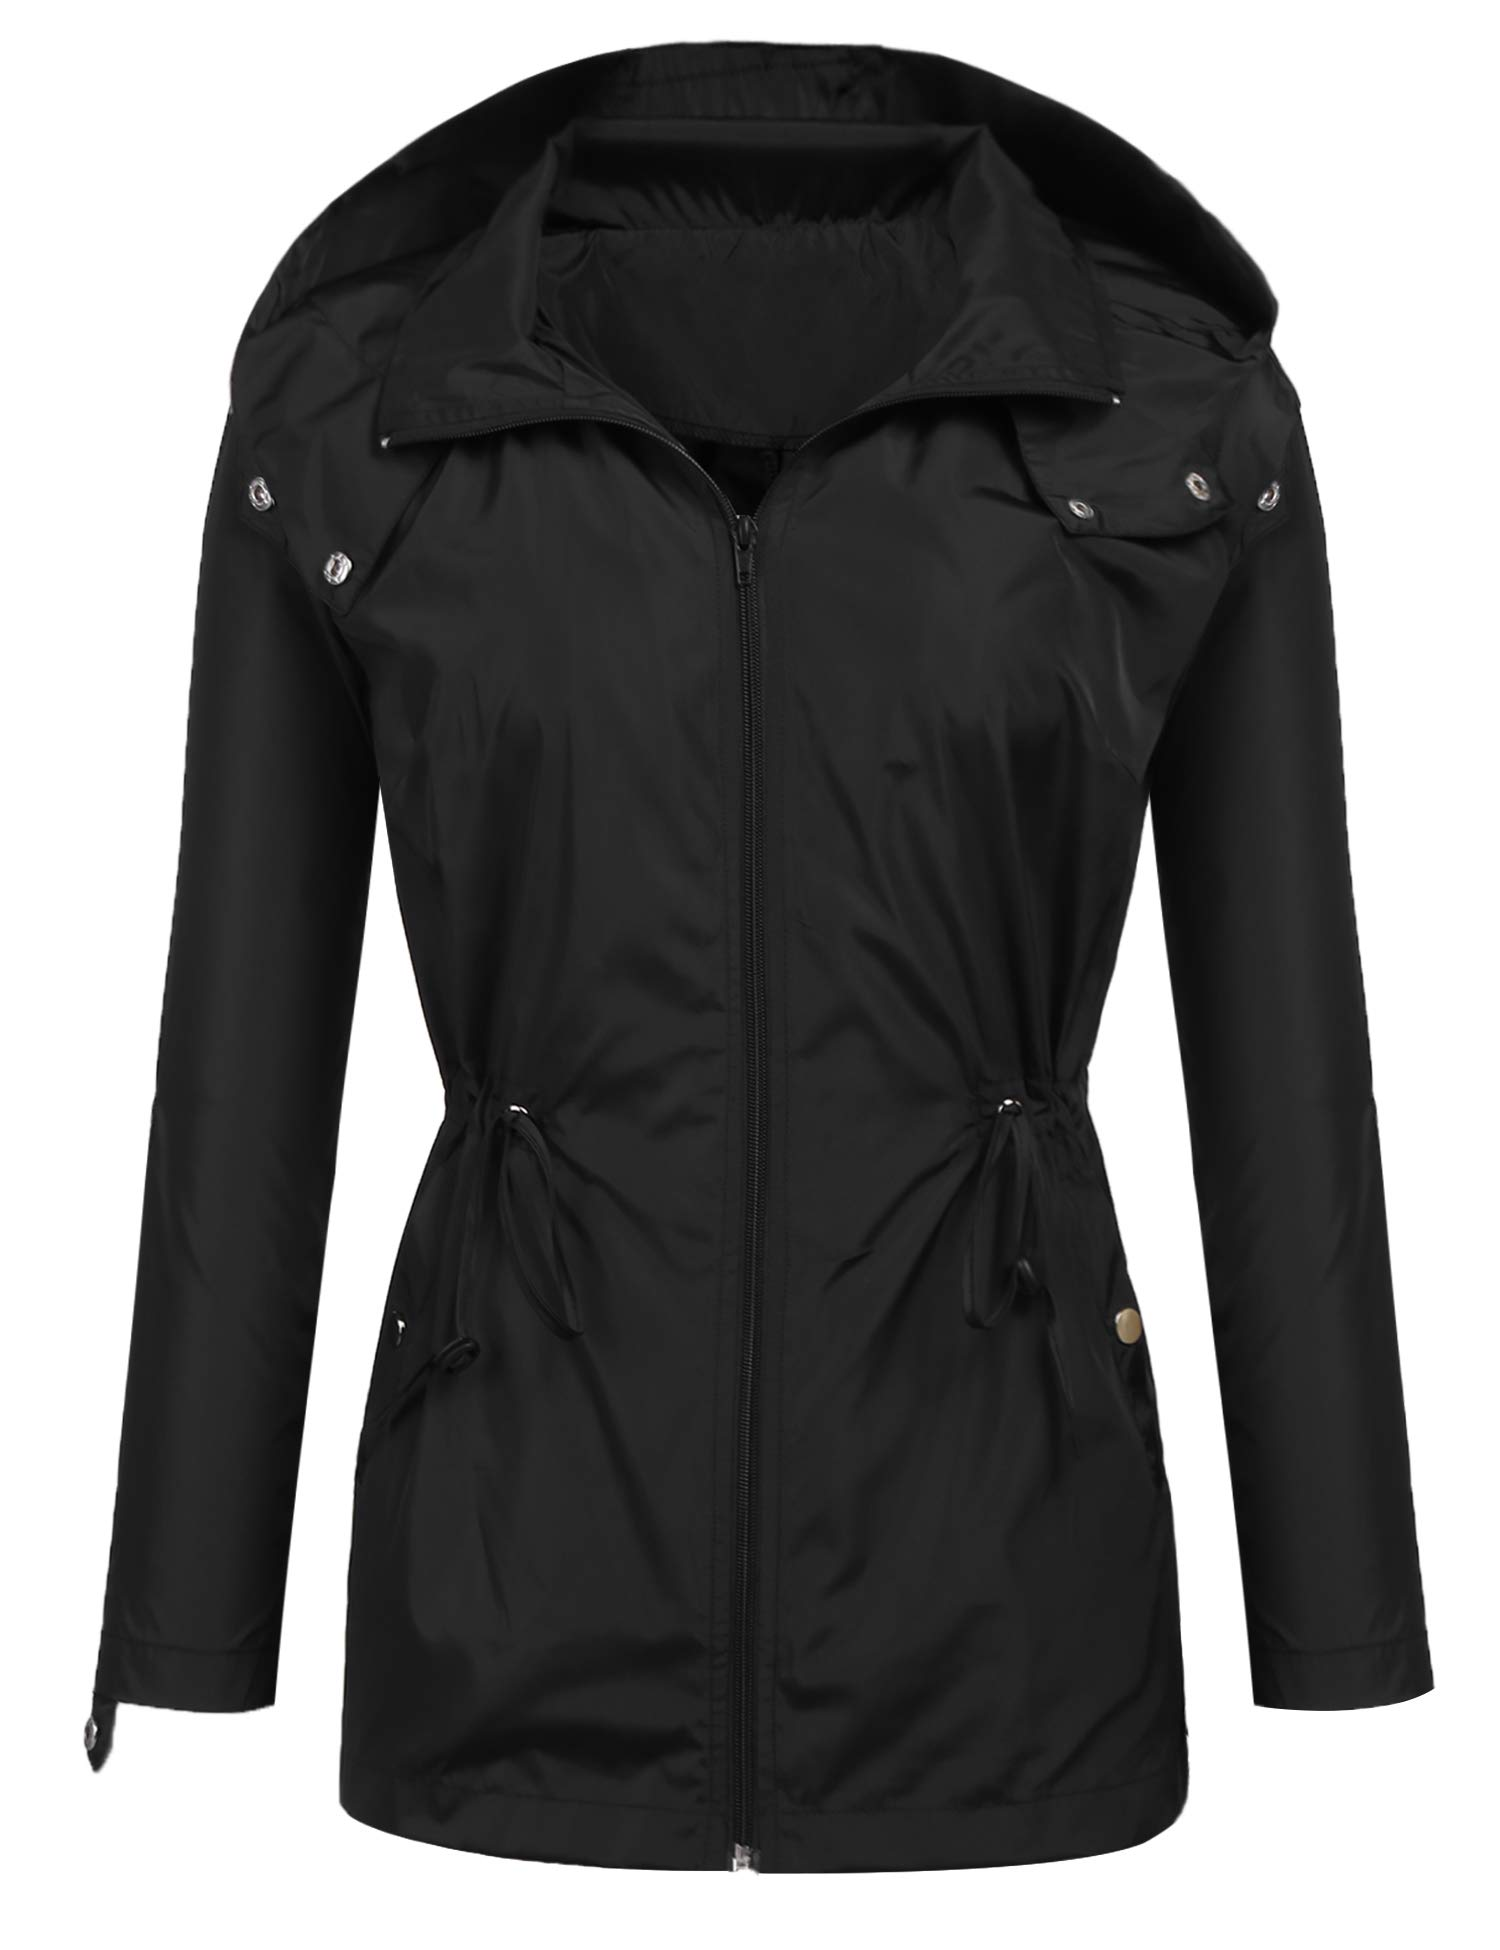 Easther Raincoats Waterproof Lightweight Rain Jacket Active Outdoor Hooded Women's Trench Coats Black Small